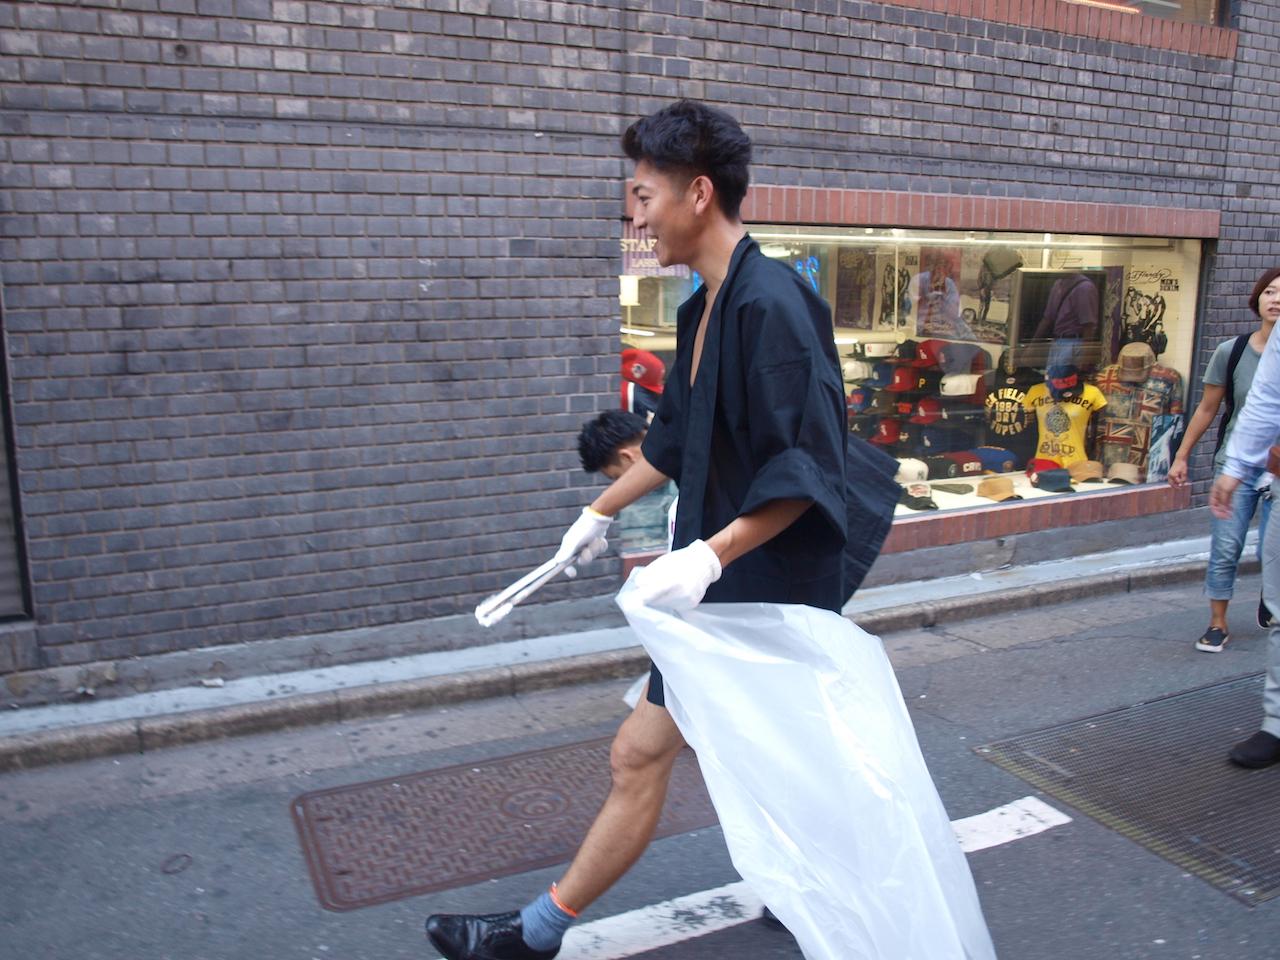 fundoshi-cleaning-yankeeintern-hassyadai-5